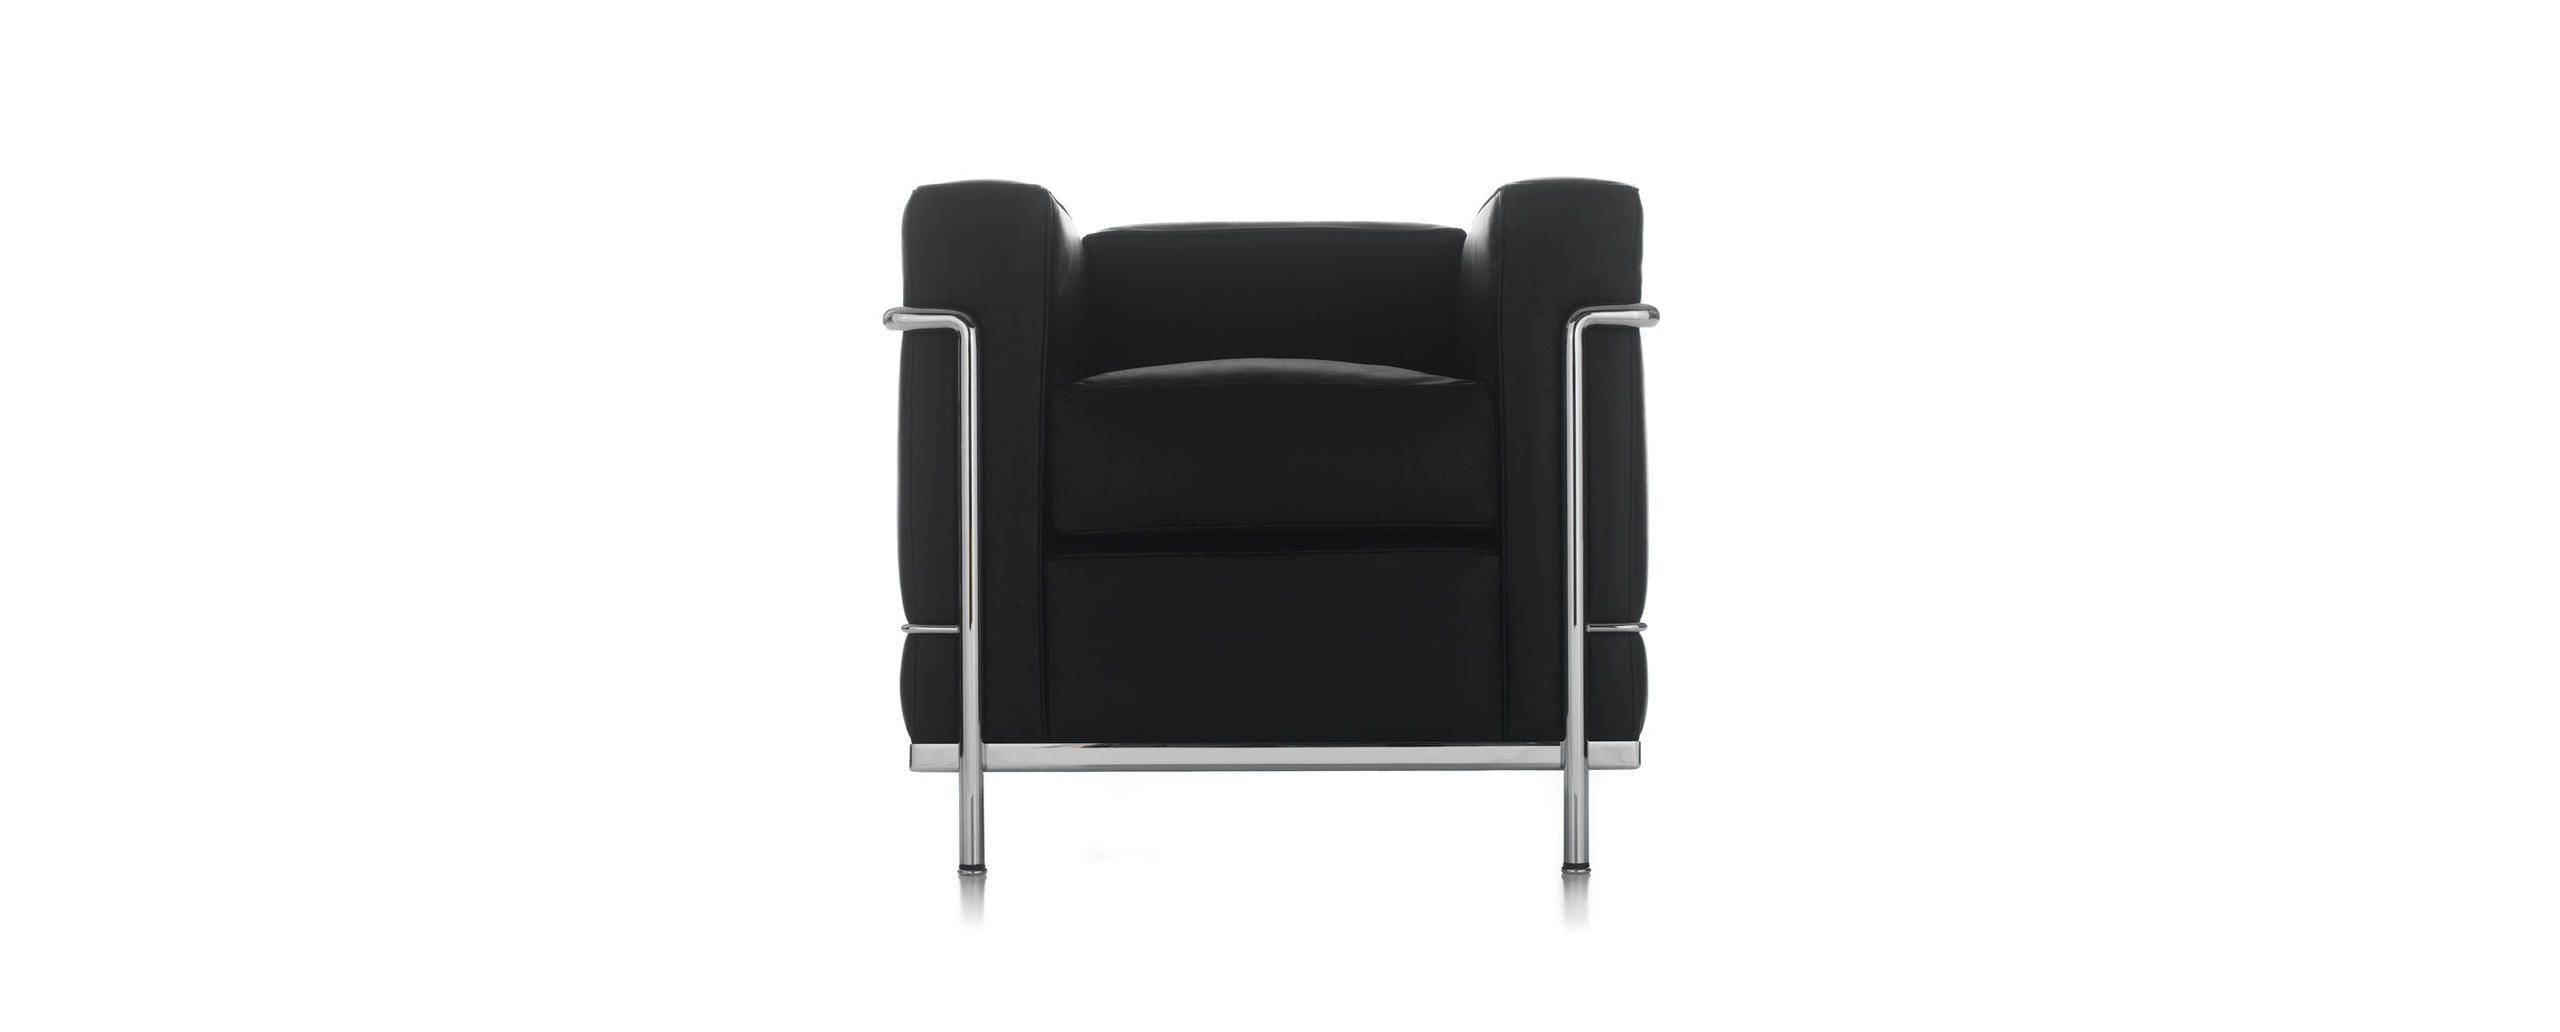 ce7294ed5250149efbd70e3884cf3308 Incroyable De Table Basse Le Corbusier Concept